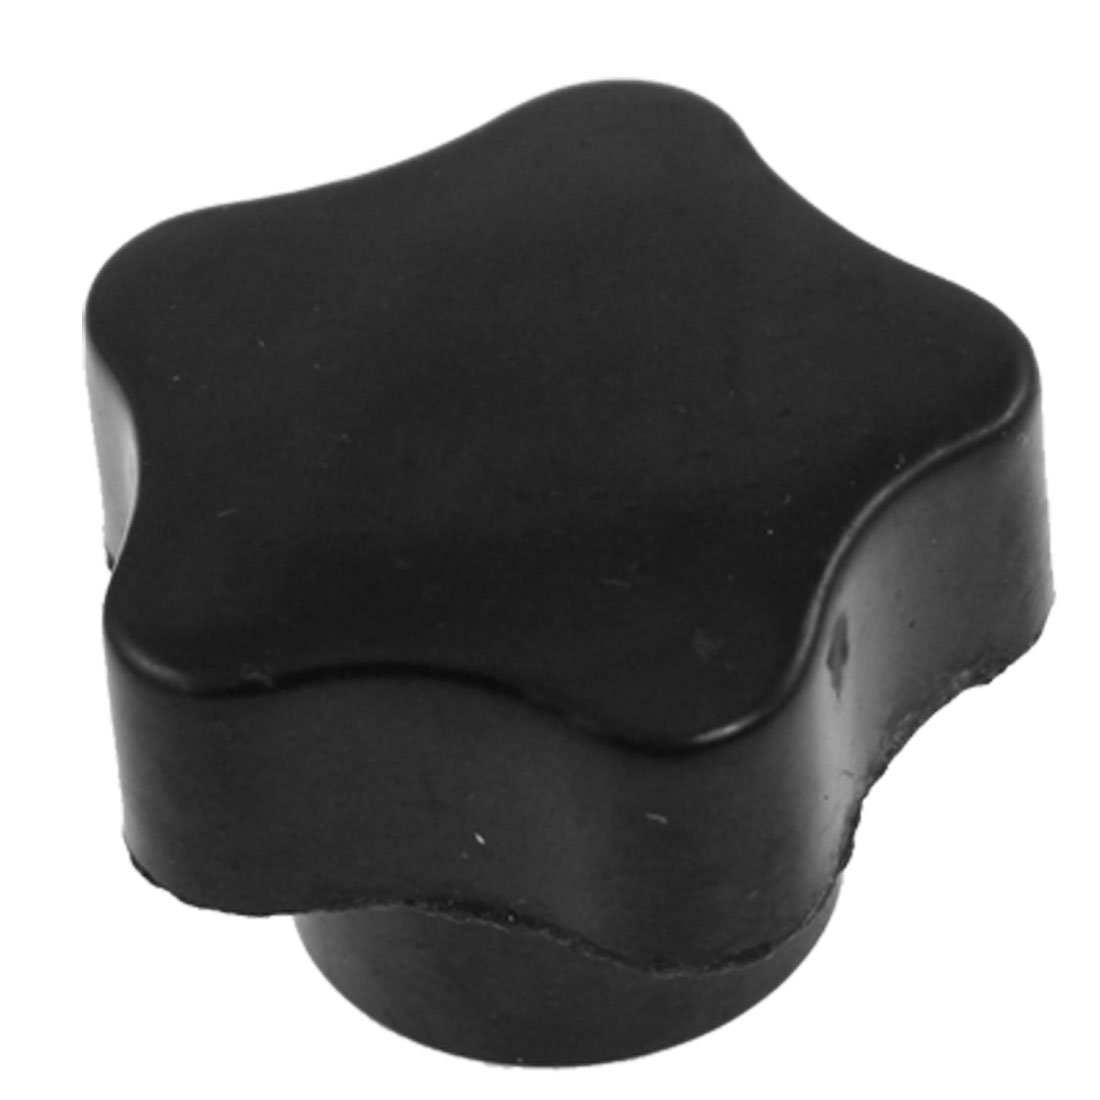 Replacement 6mm Diameter Female Thread Black Plastic Grip Star Knob